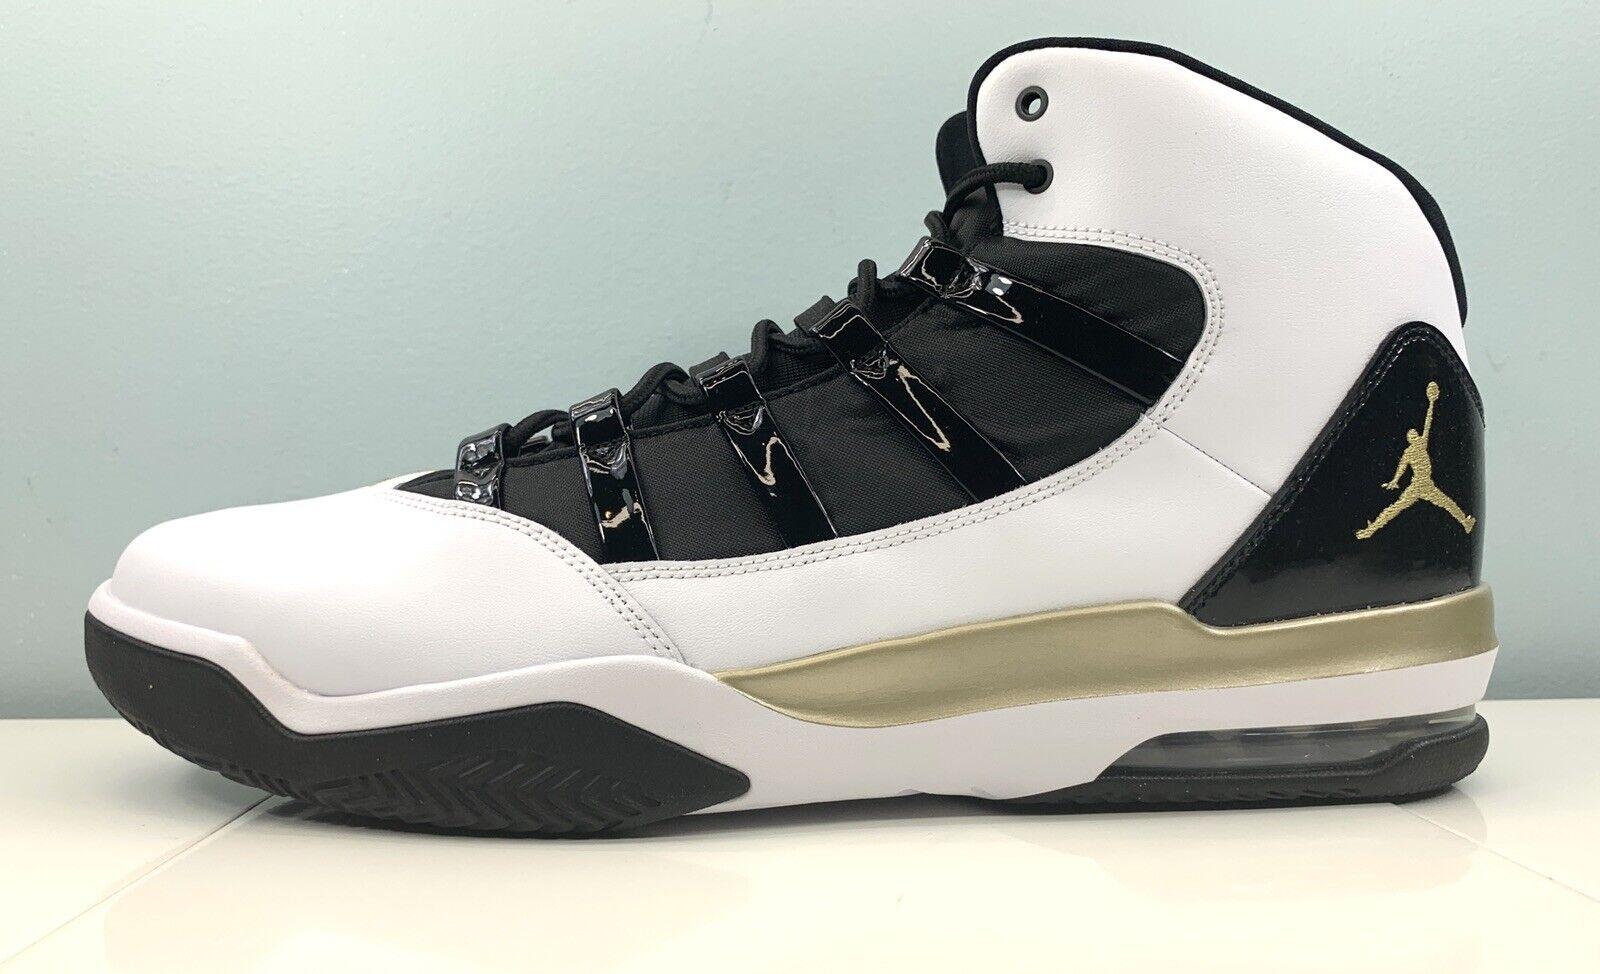 Size 11.5 - Jordan Max Aura White Black Gold for sale online   eBay